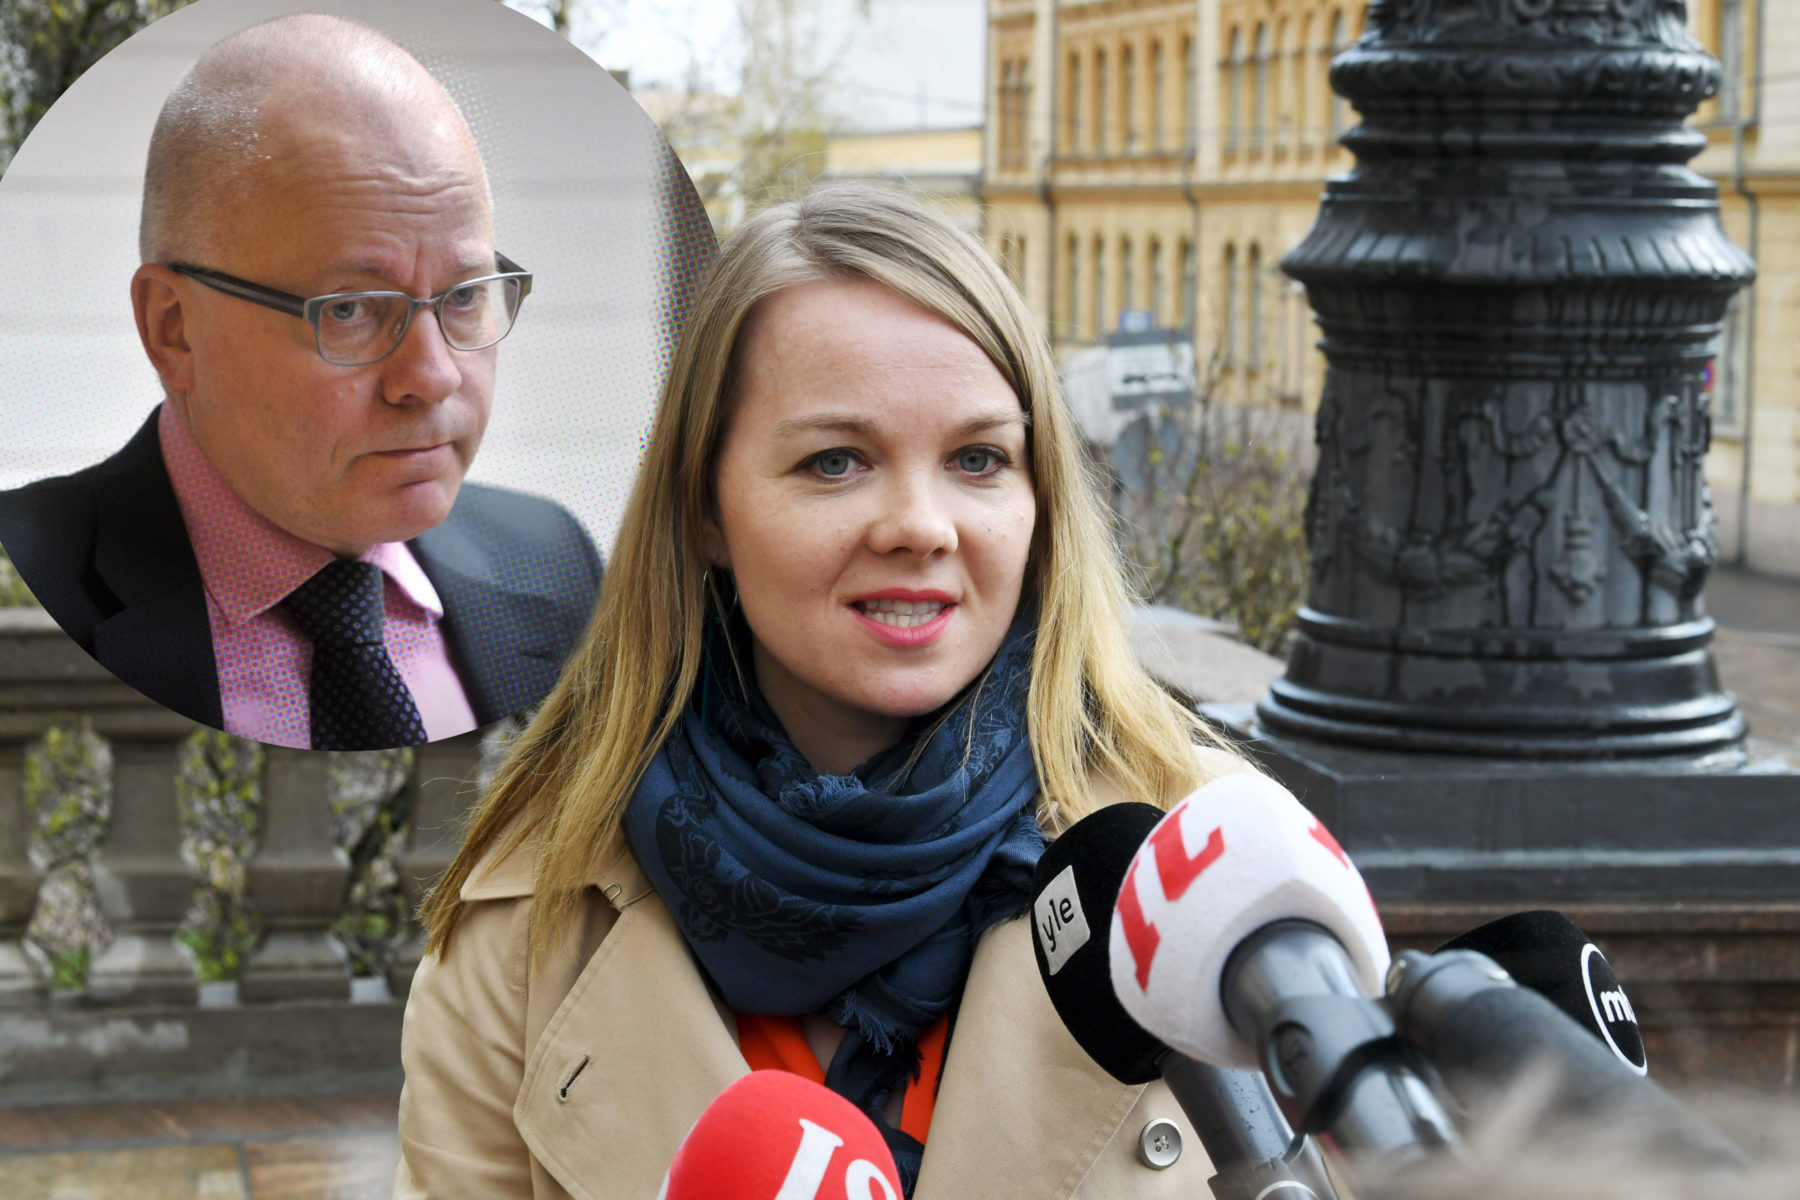 suomenkuvalehti.fi